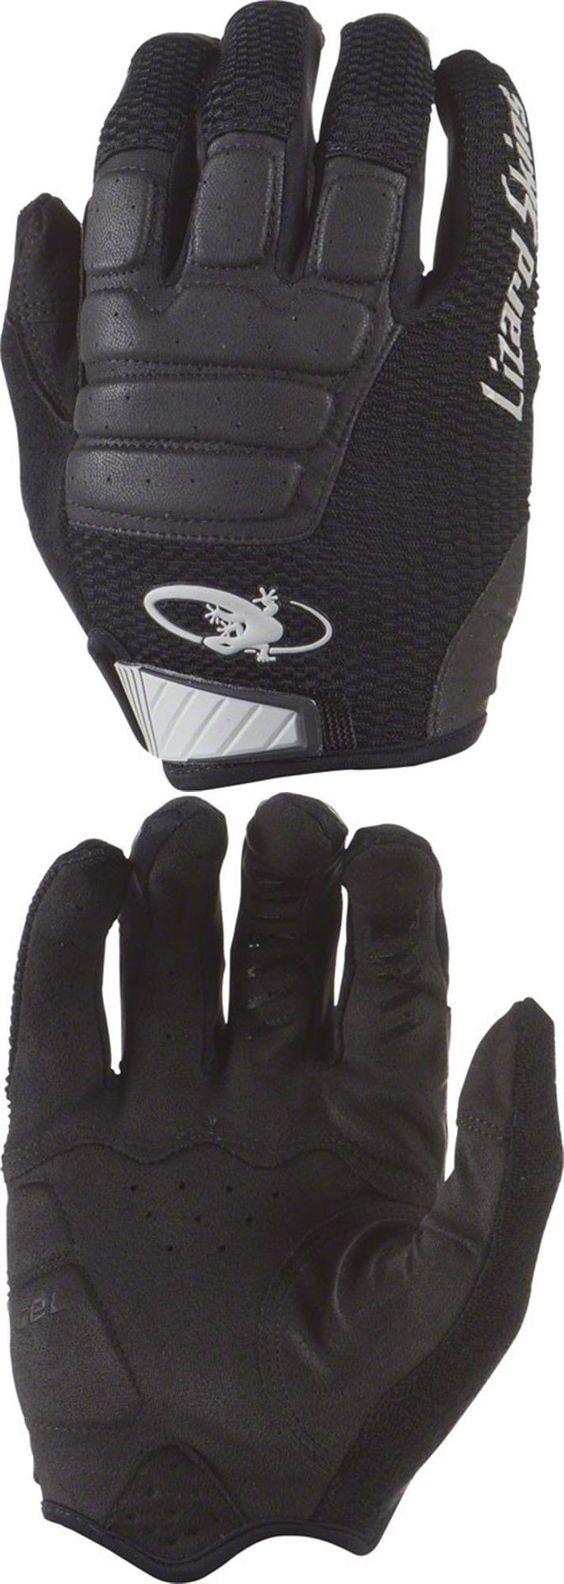 Gloves lizard skins monitor hd gloves jet black xl ue buy it